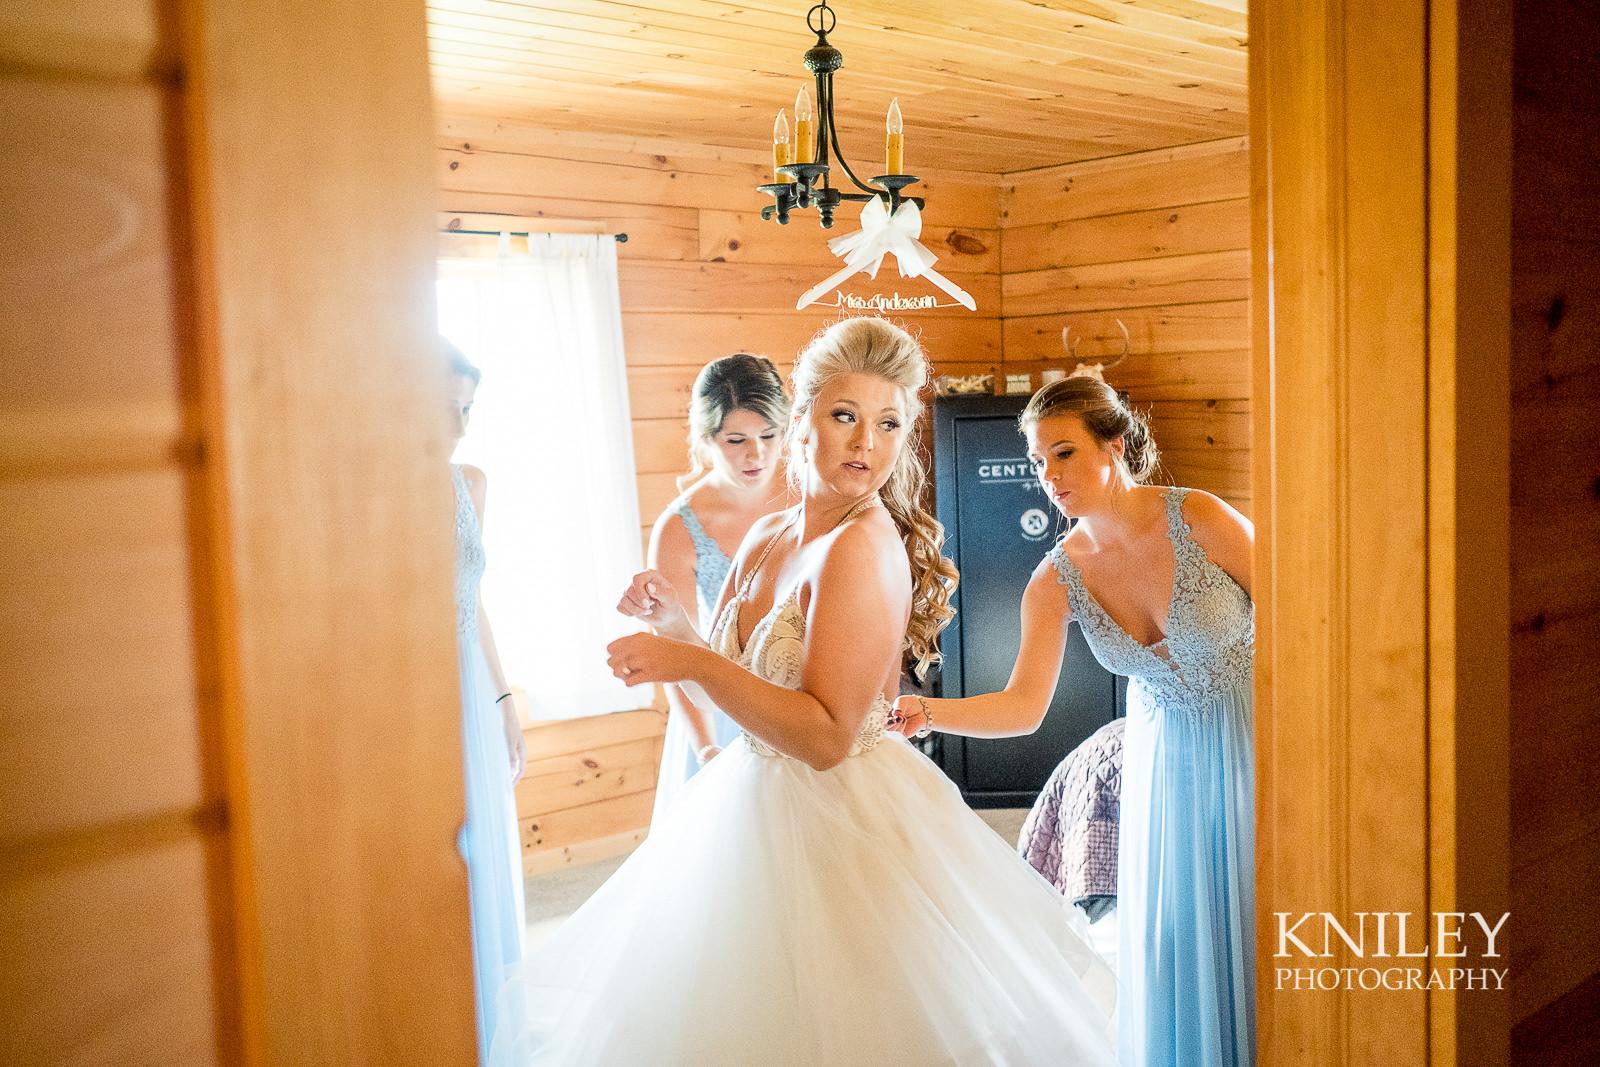 028 - Buffalo NY wedding - Preparation pictures - XT2A6703.jpg